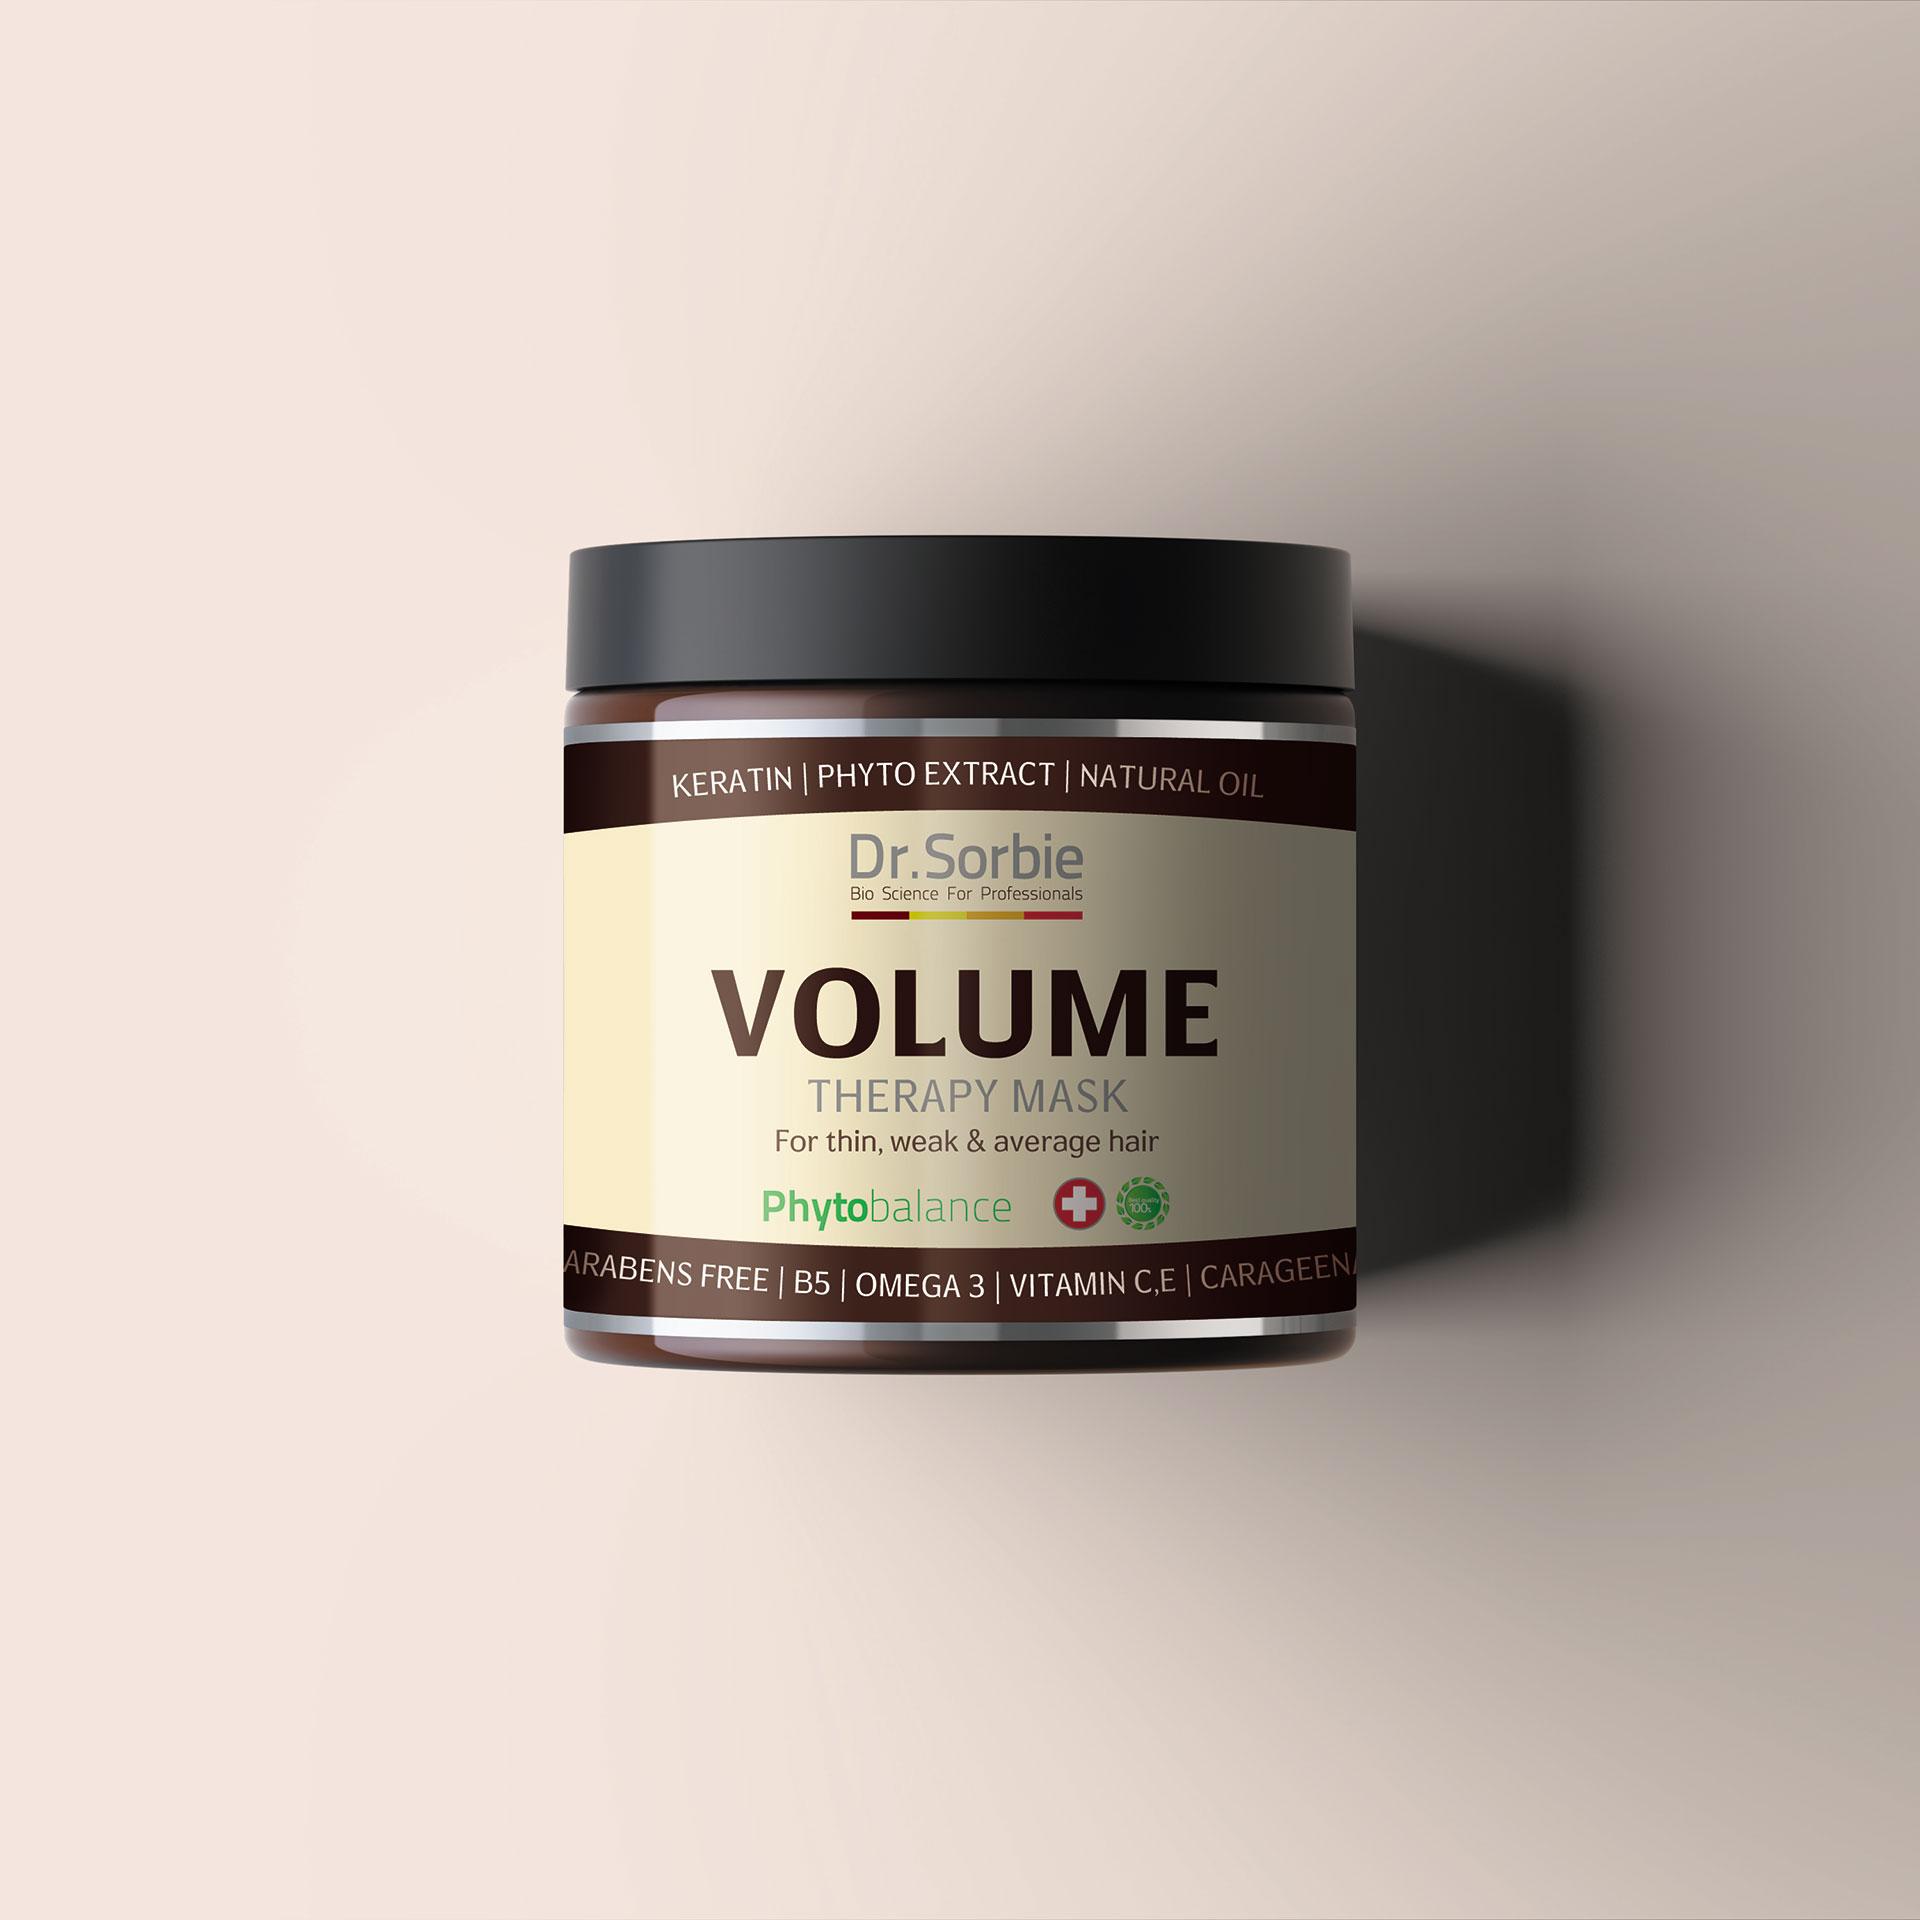 Volume-Mask by Dr. Sorbie